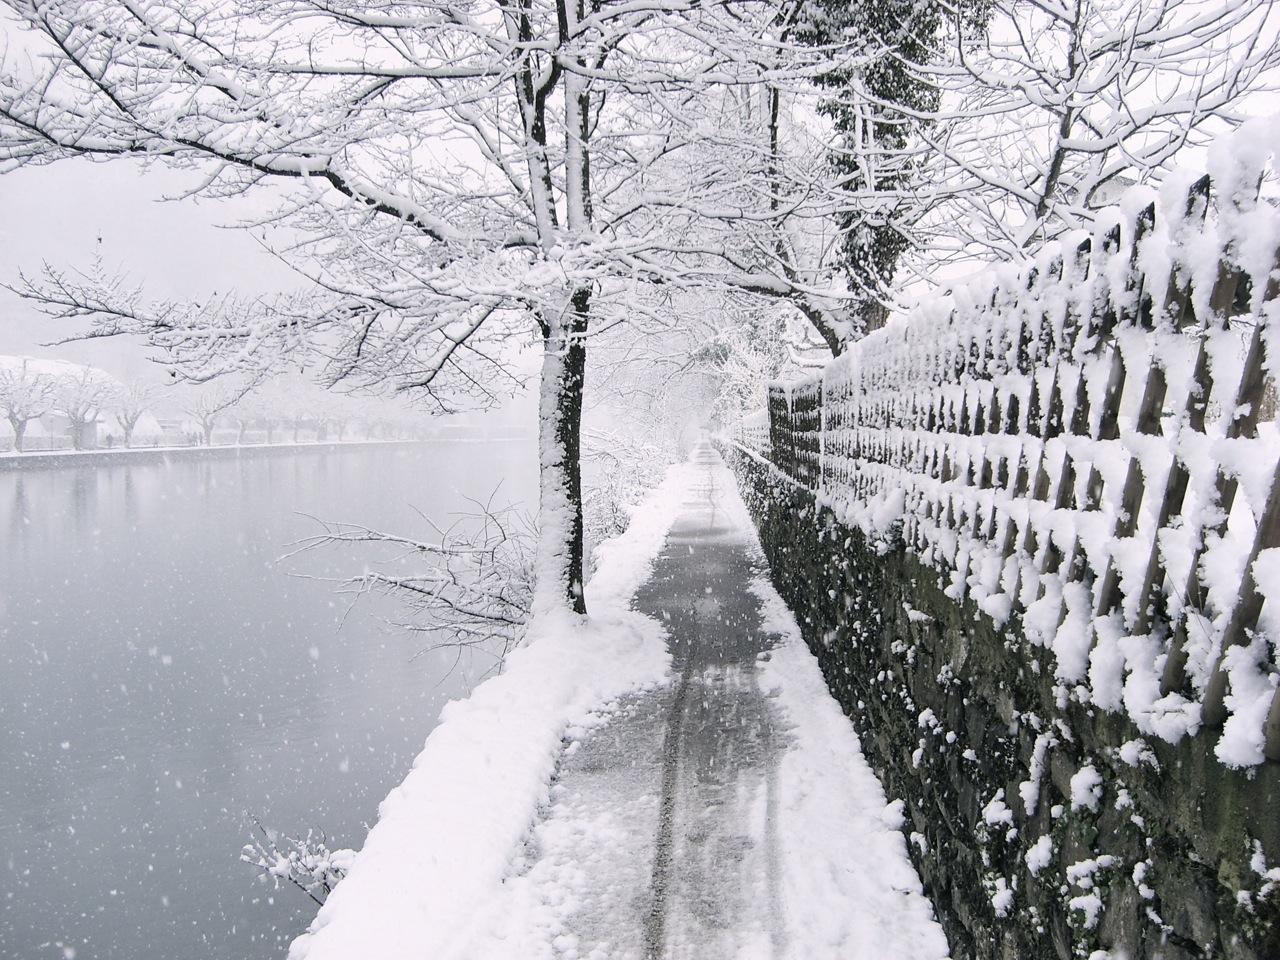 A walk in the snow. Thun. Switzerland.